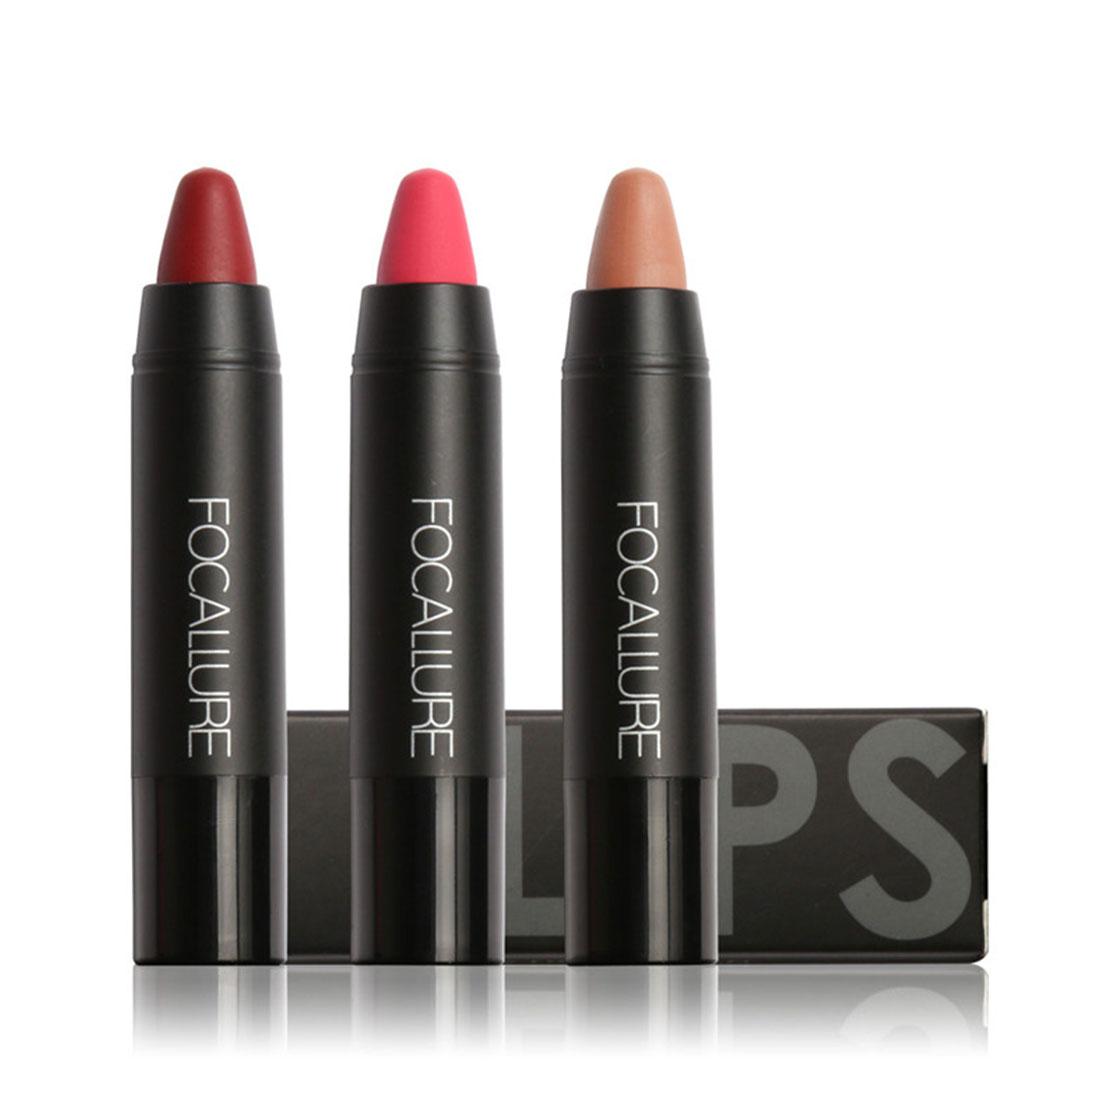 TOP FOCALLURE Waterproof Long-lasting Red Velvet Nude Tattoo Matte True Brown Color Pencil Lipstick Crayon Lot Makeup Set